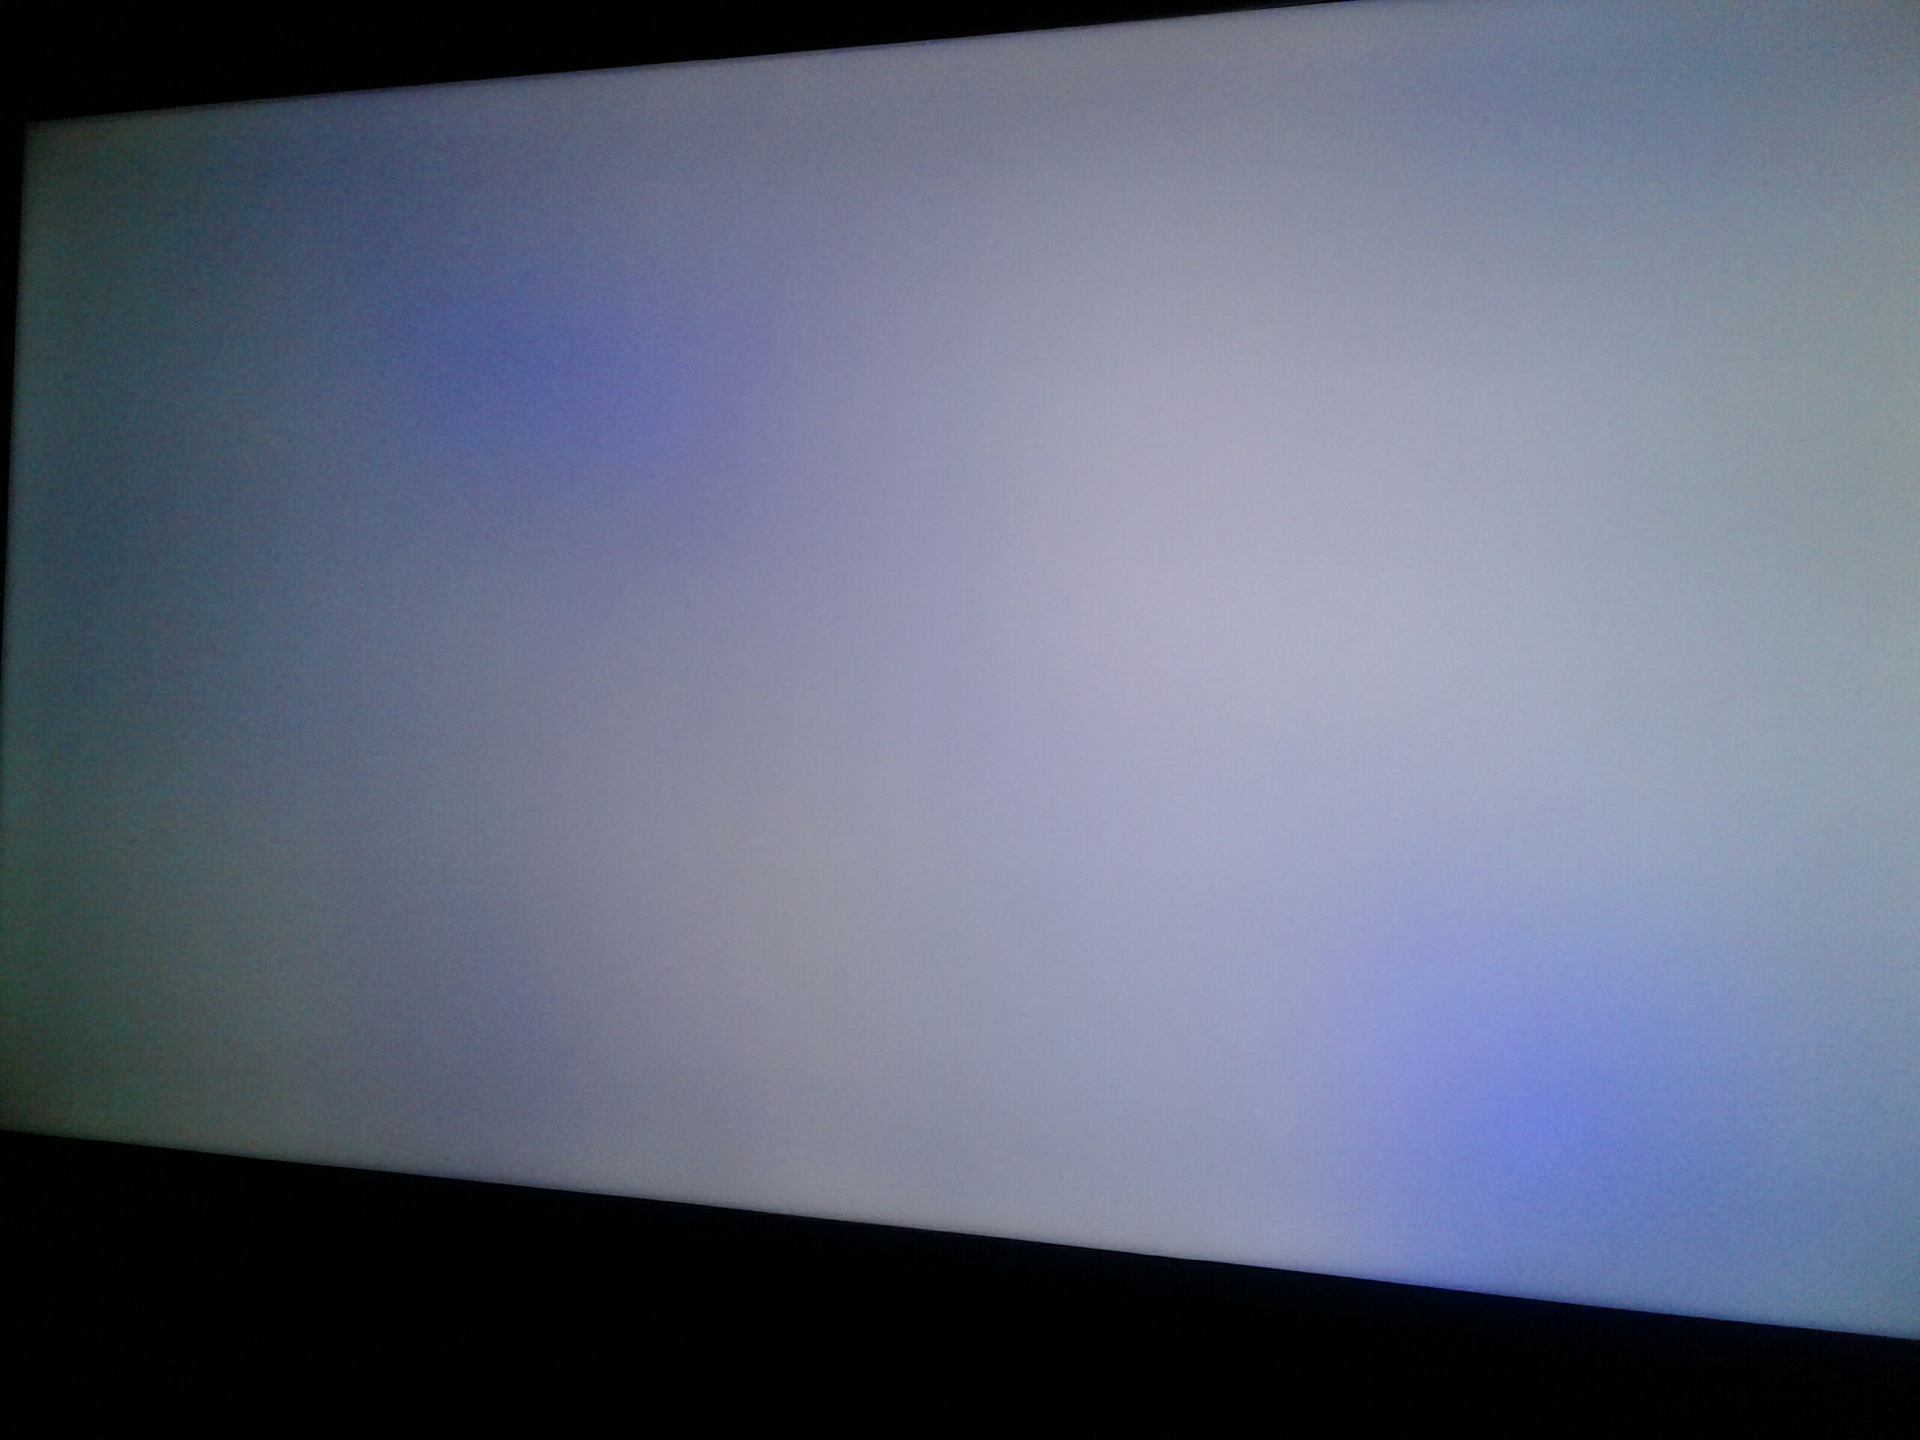 PURPLE SPOTS on Samsung 4k LED UHD TV SCREENS - Samsung